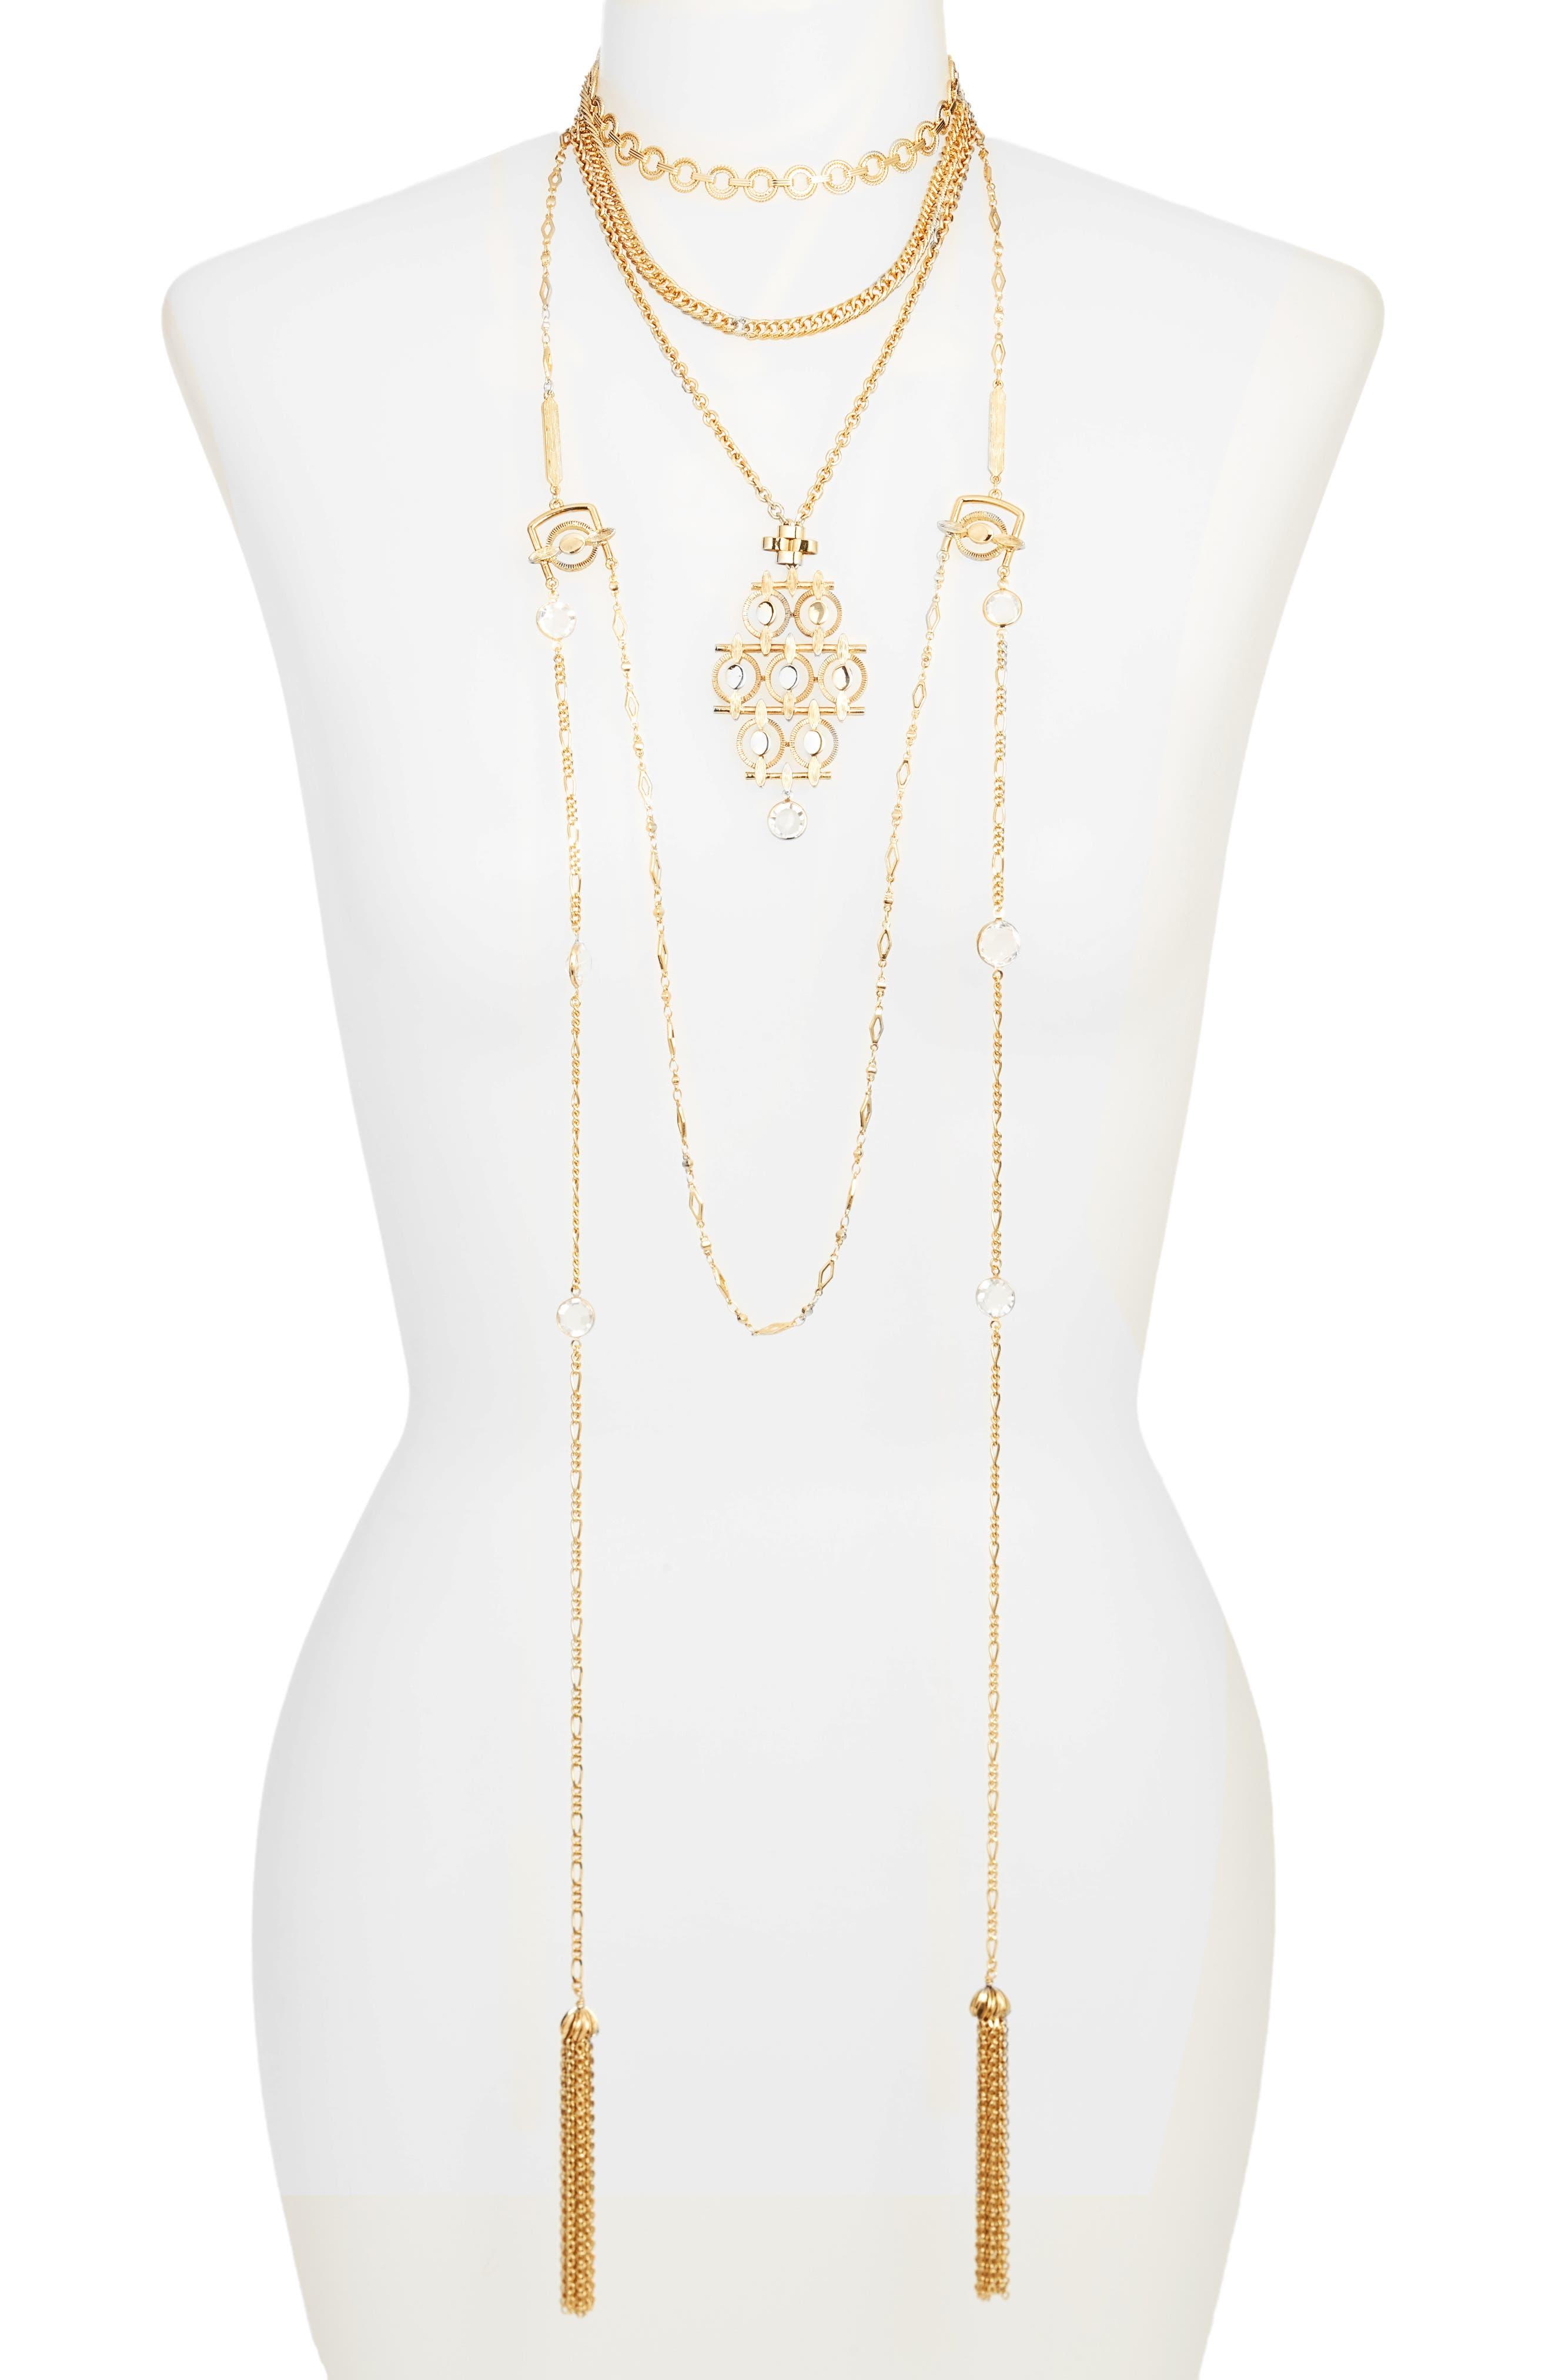 Main Image - Badgley Mischka Layered Tassel Necklace